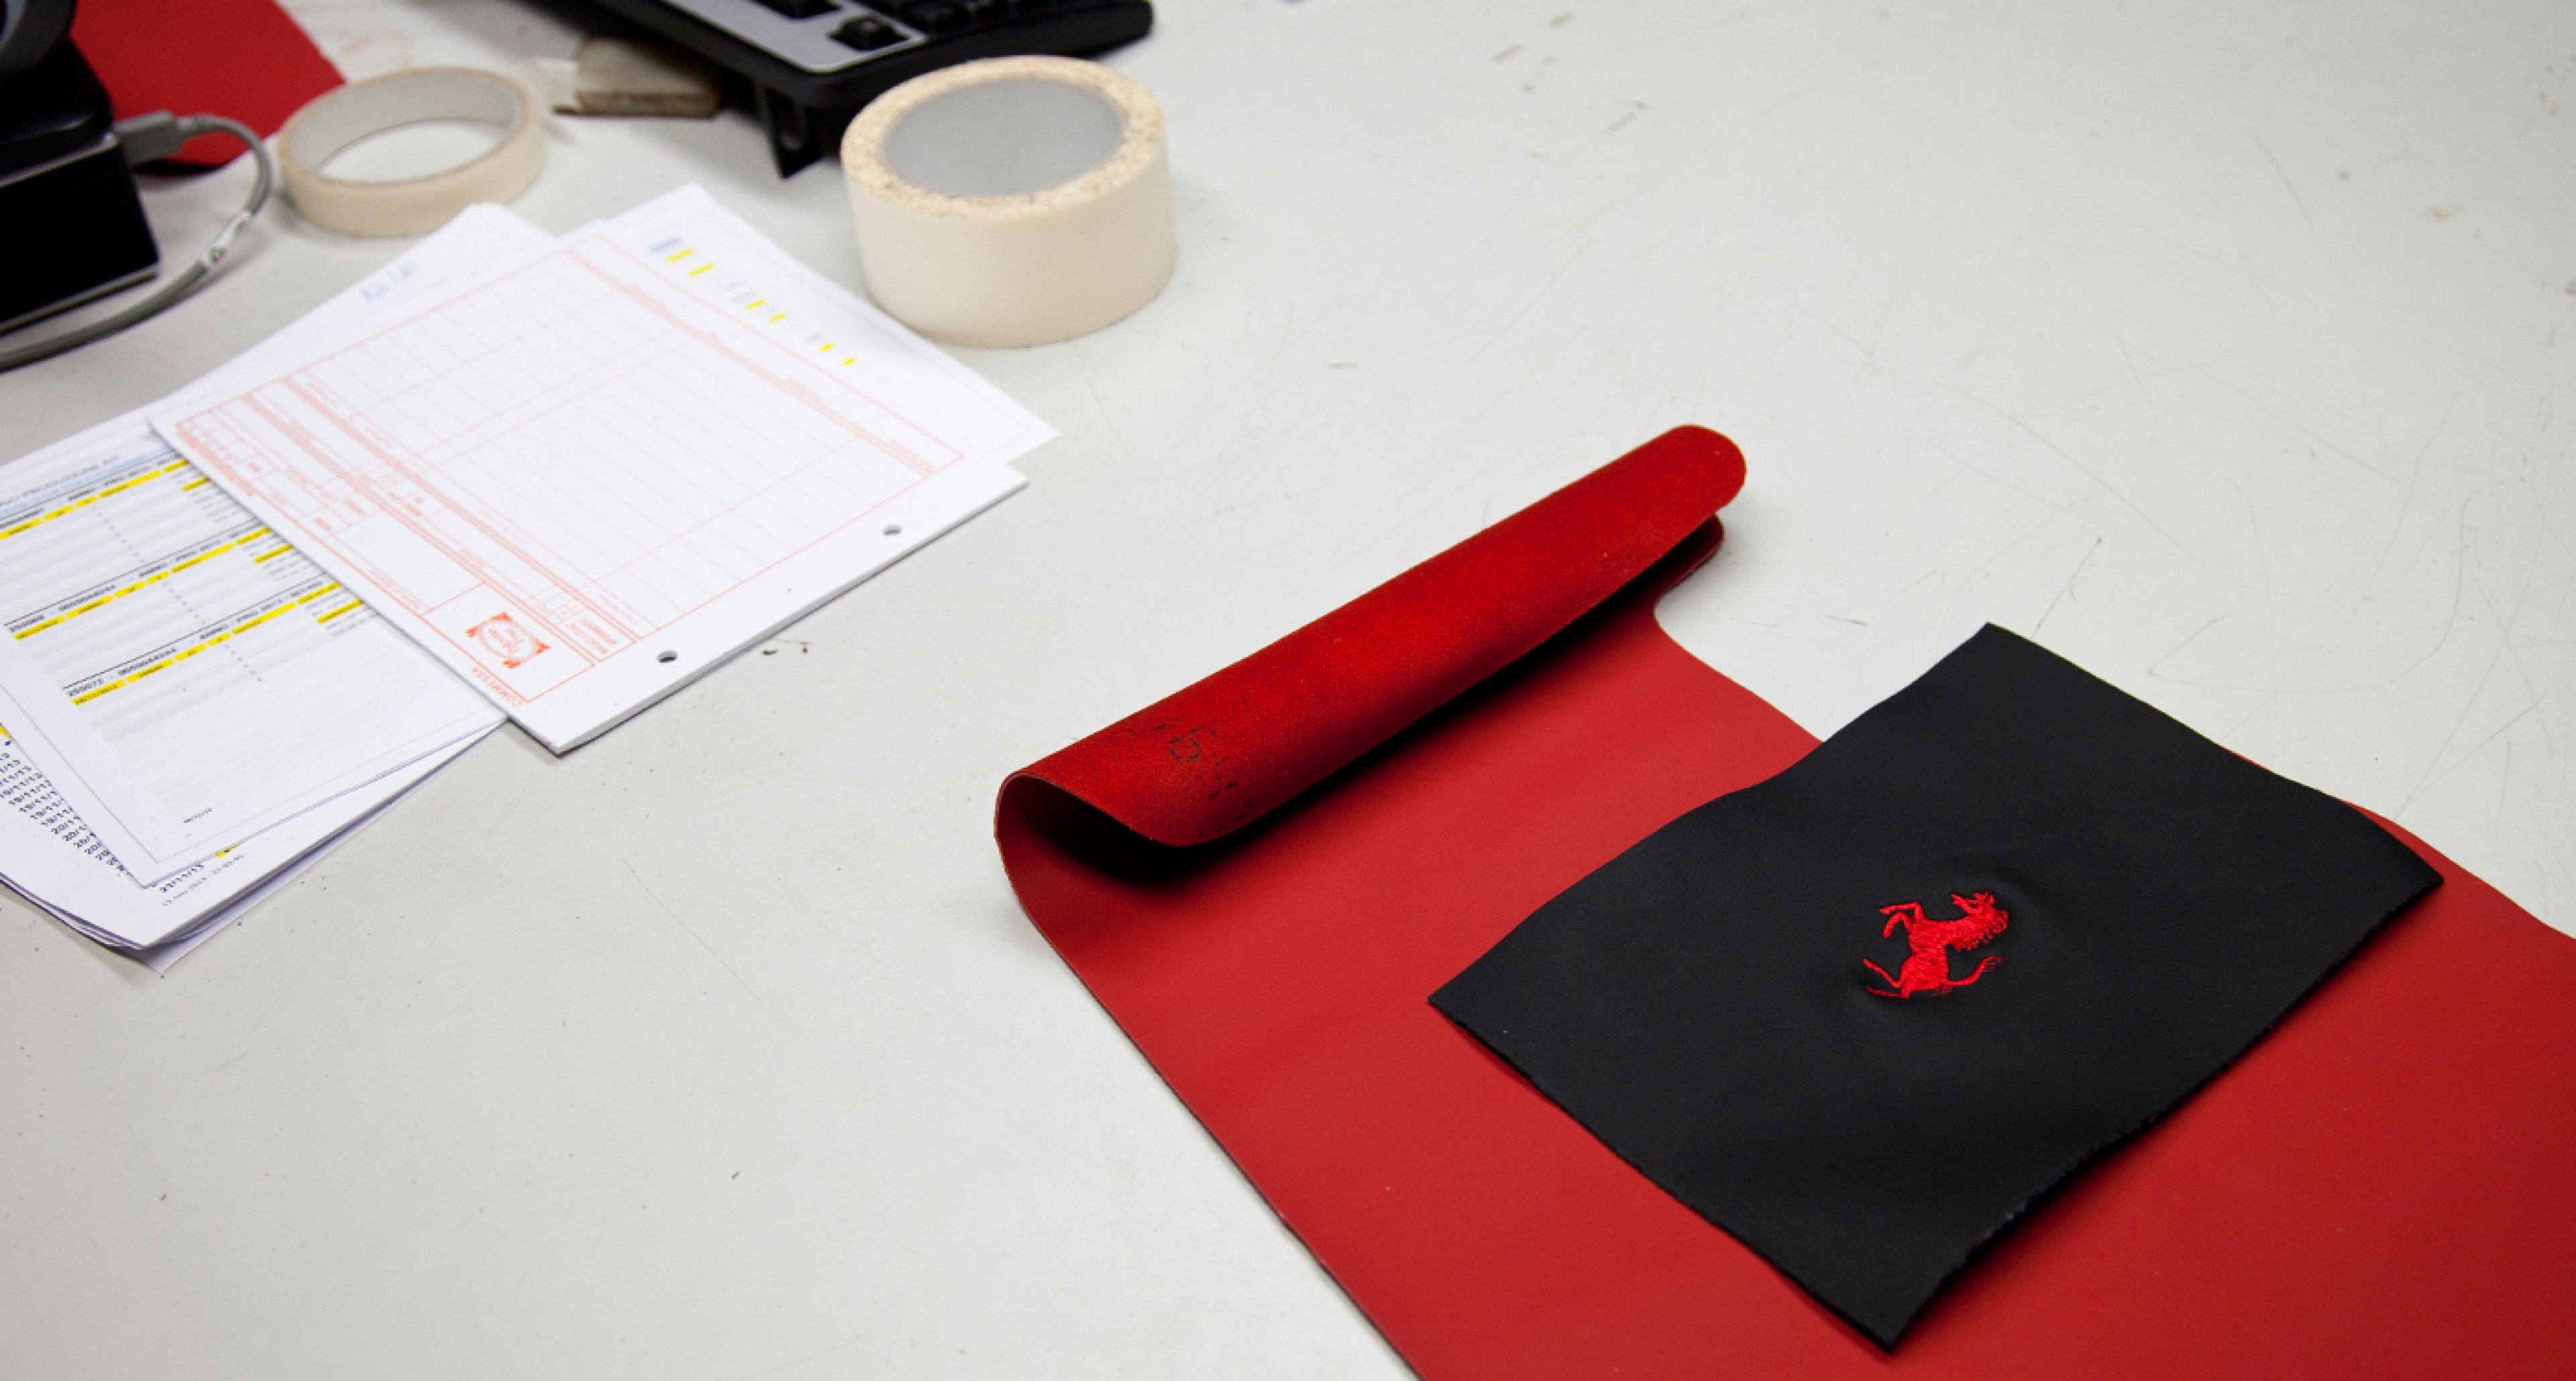 Ferrari logo samples at Poltrona Frau factory.